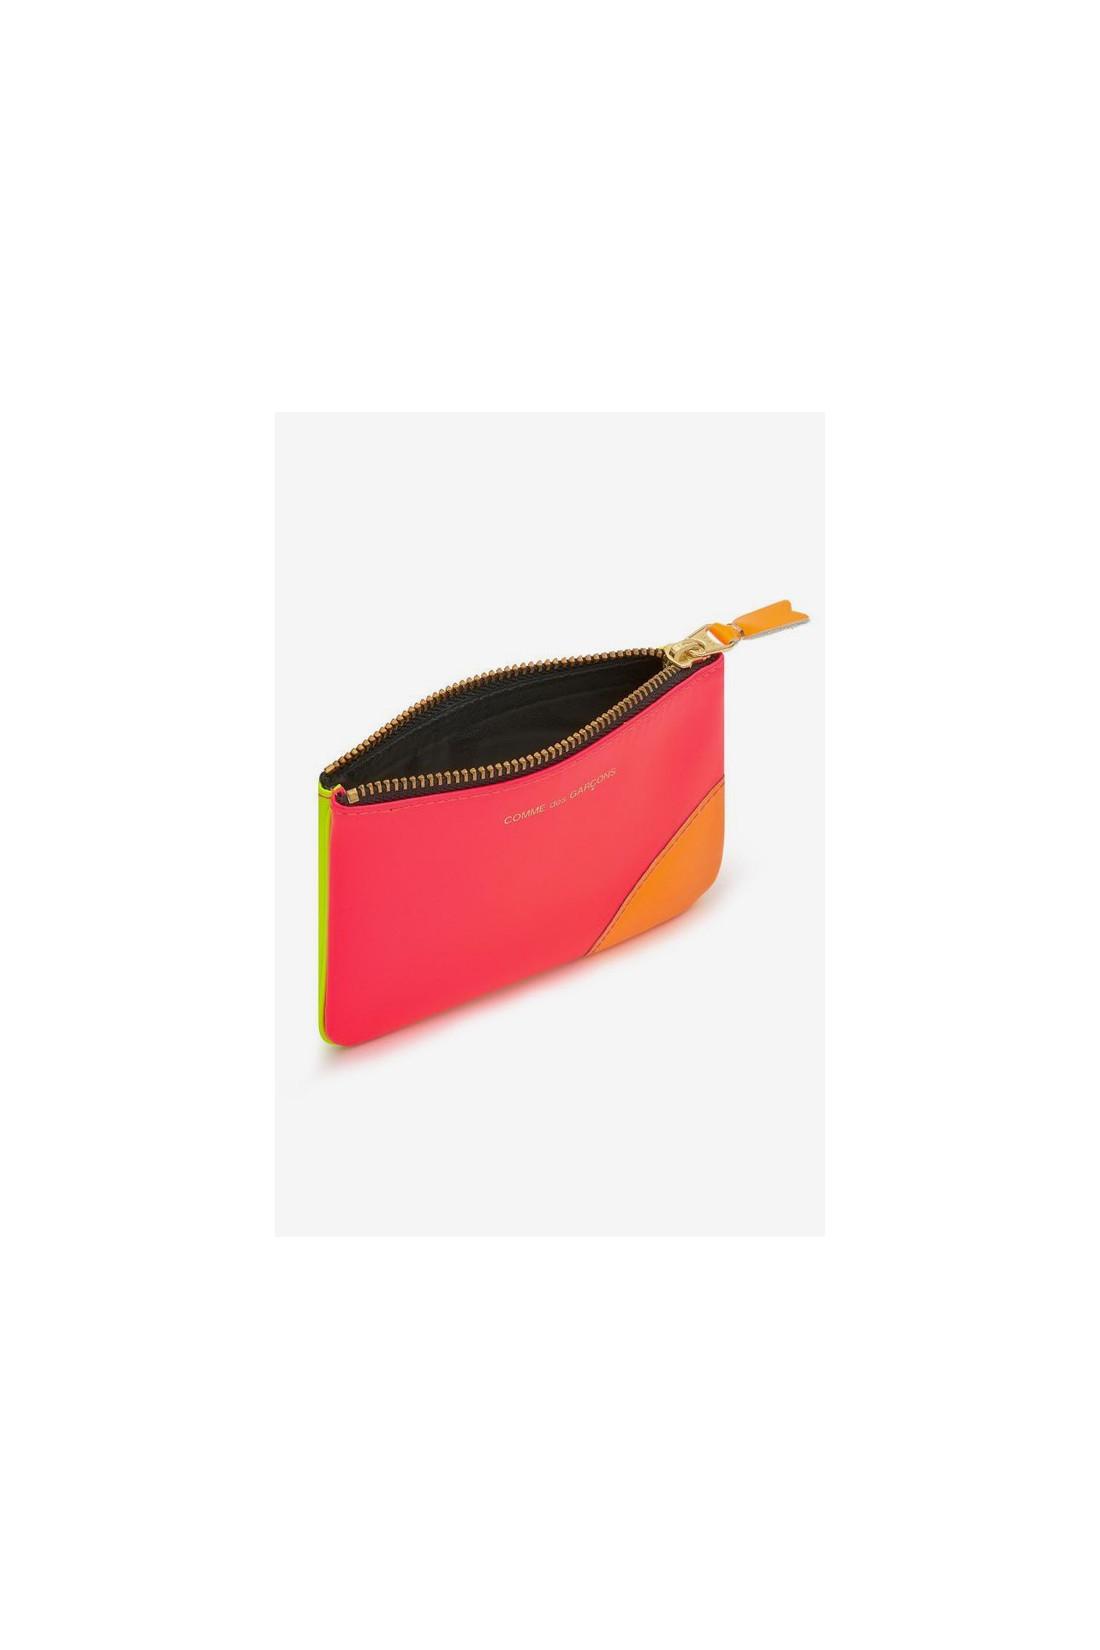 COMME DES GARÇONS WALLETS / Cdg super fluo sa8100sf Pink yellow